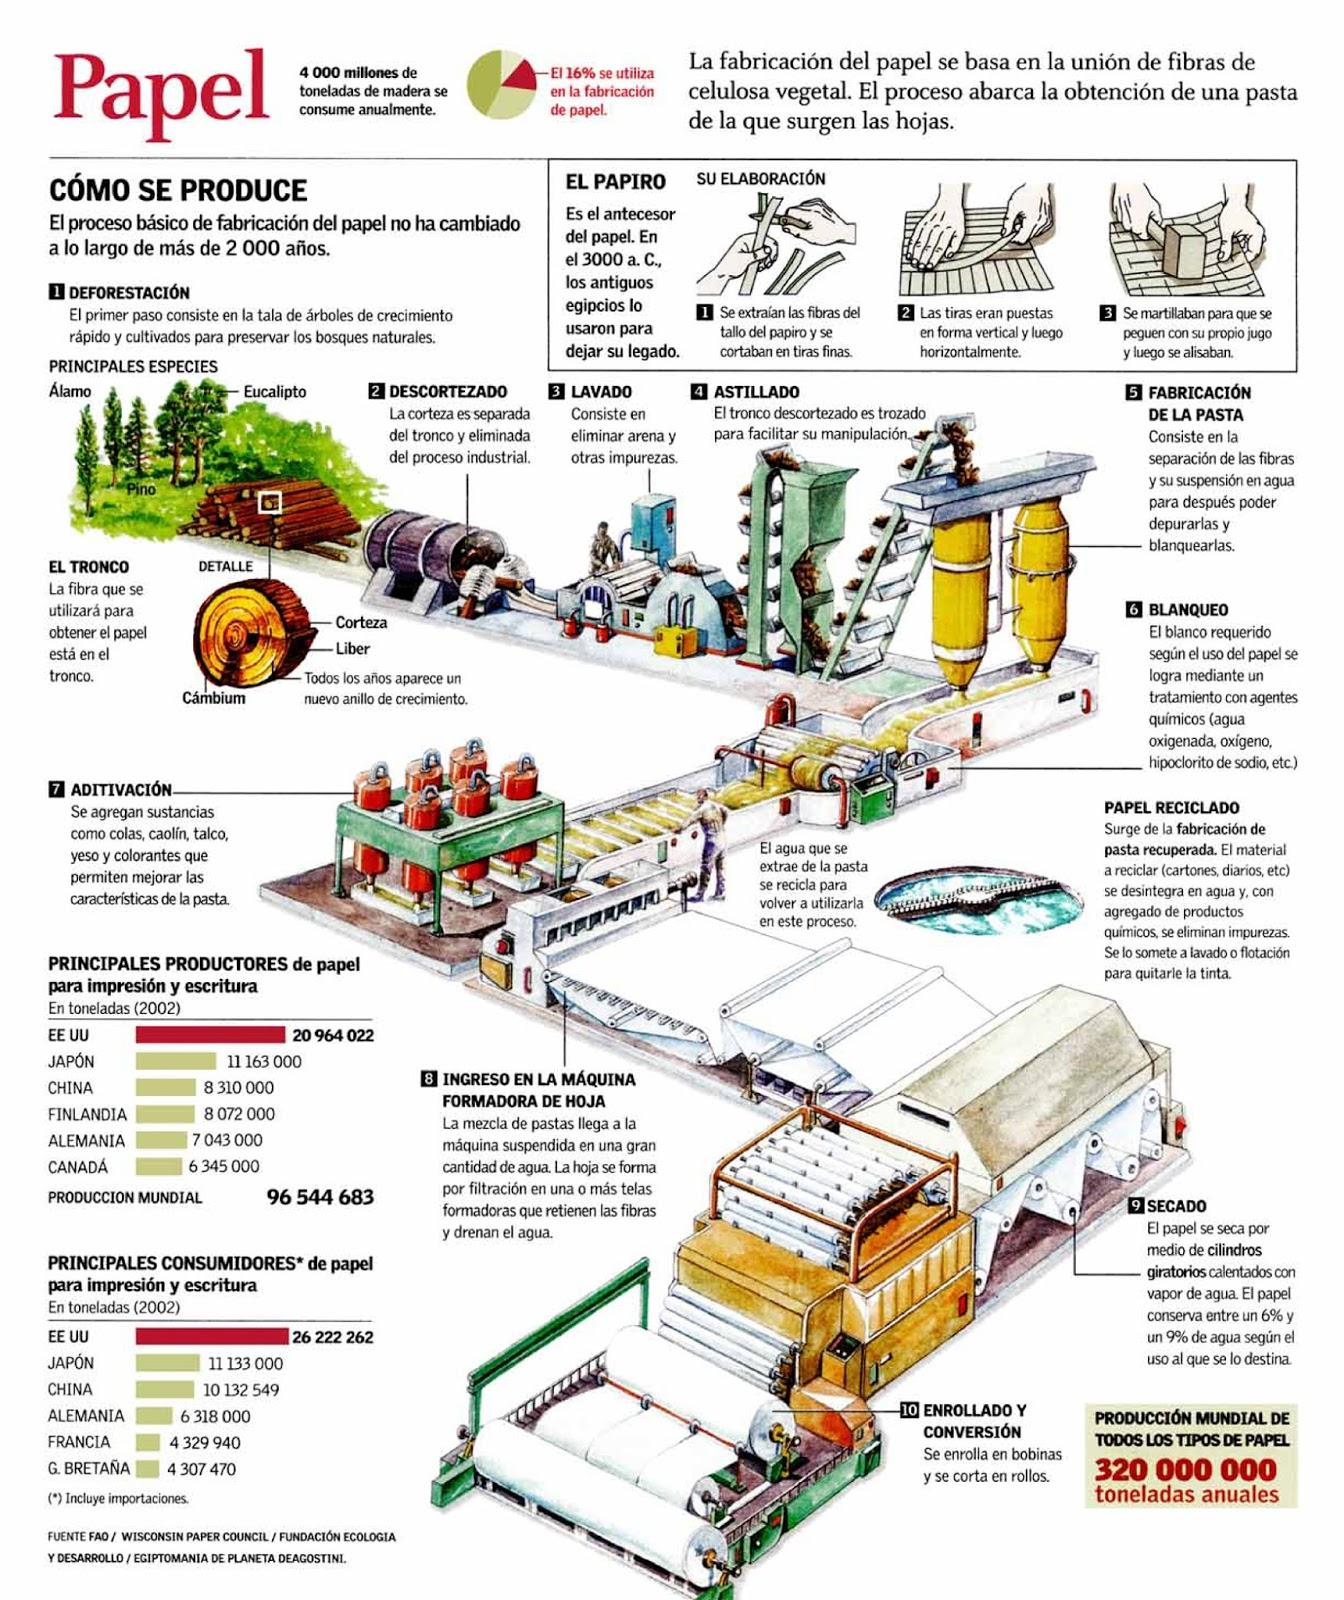 Tecnolog a edh infograf a proceso de producci n del papel for Descripcion del proceso de produccion